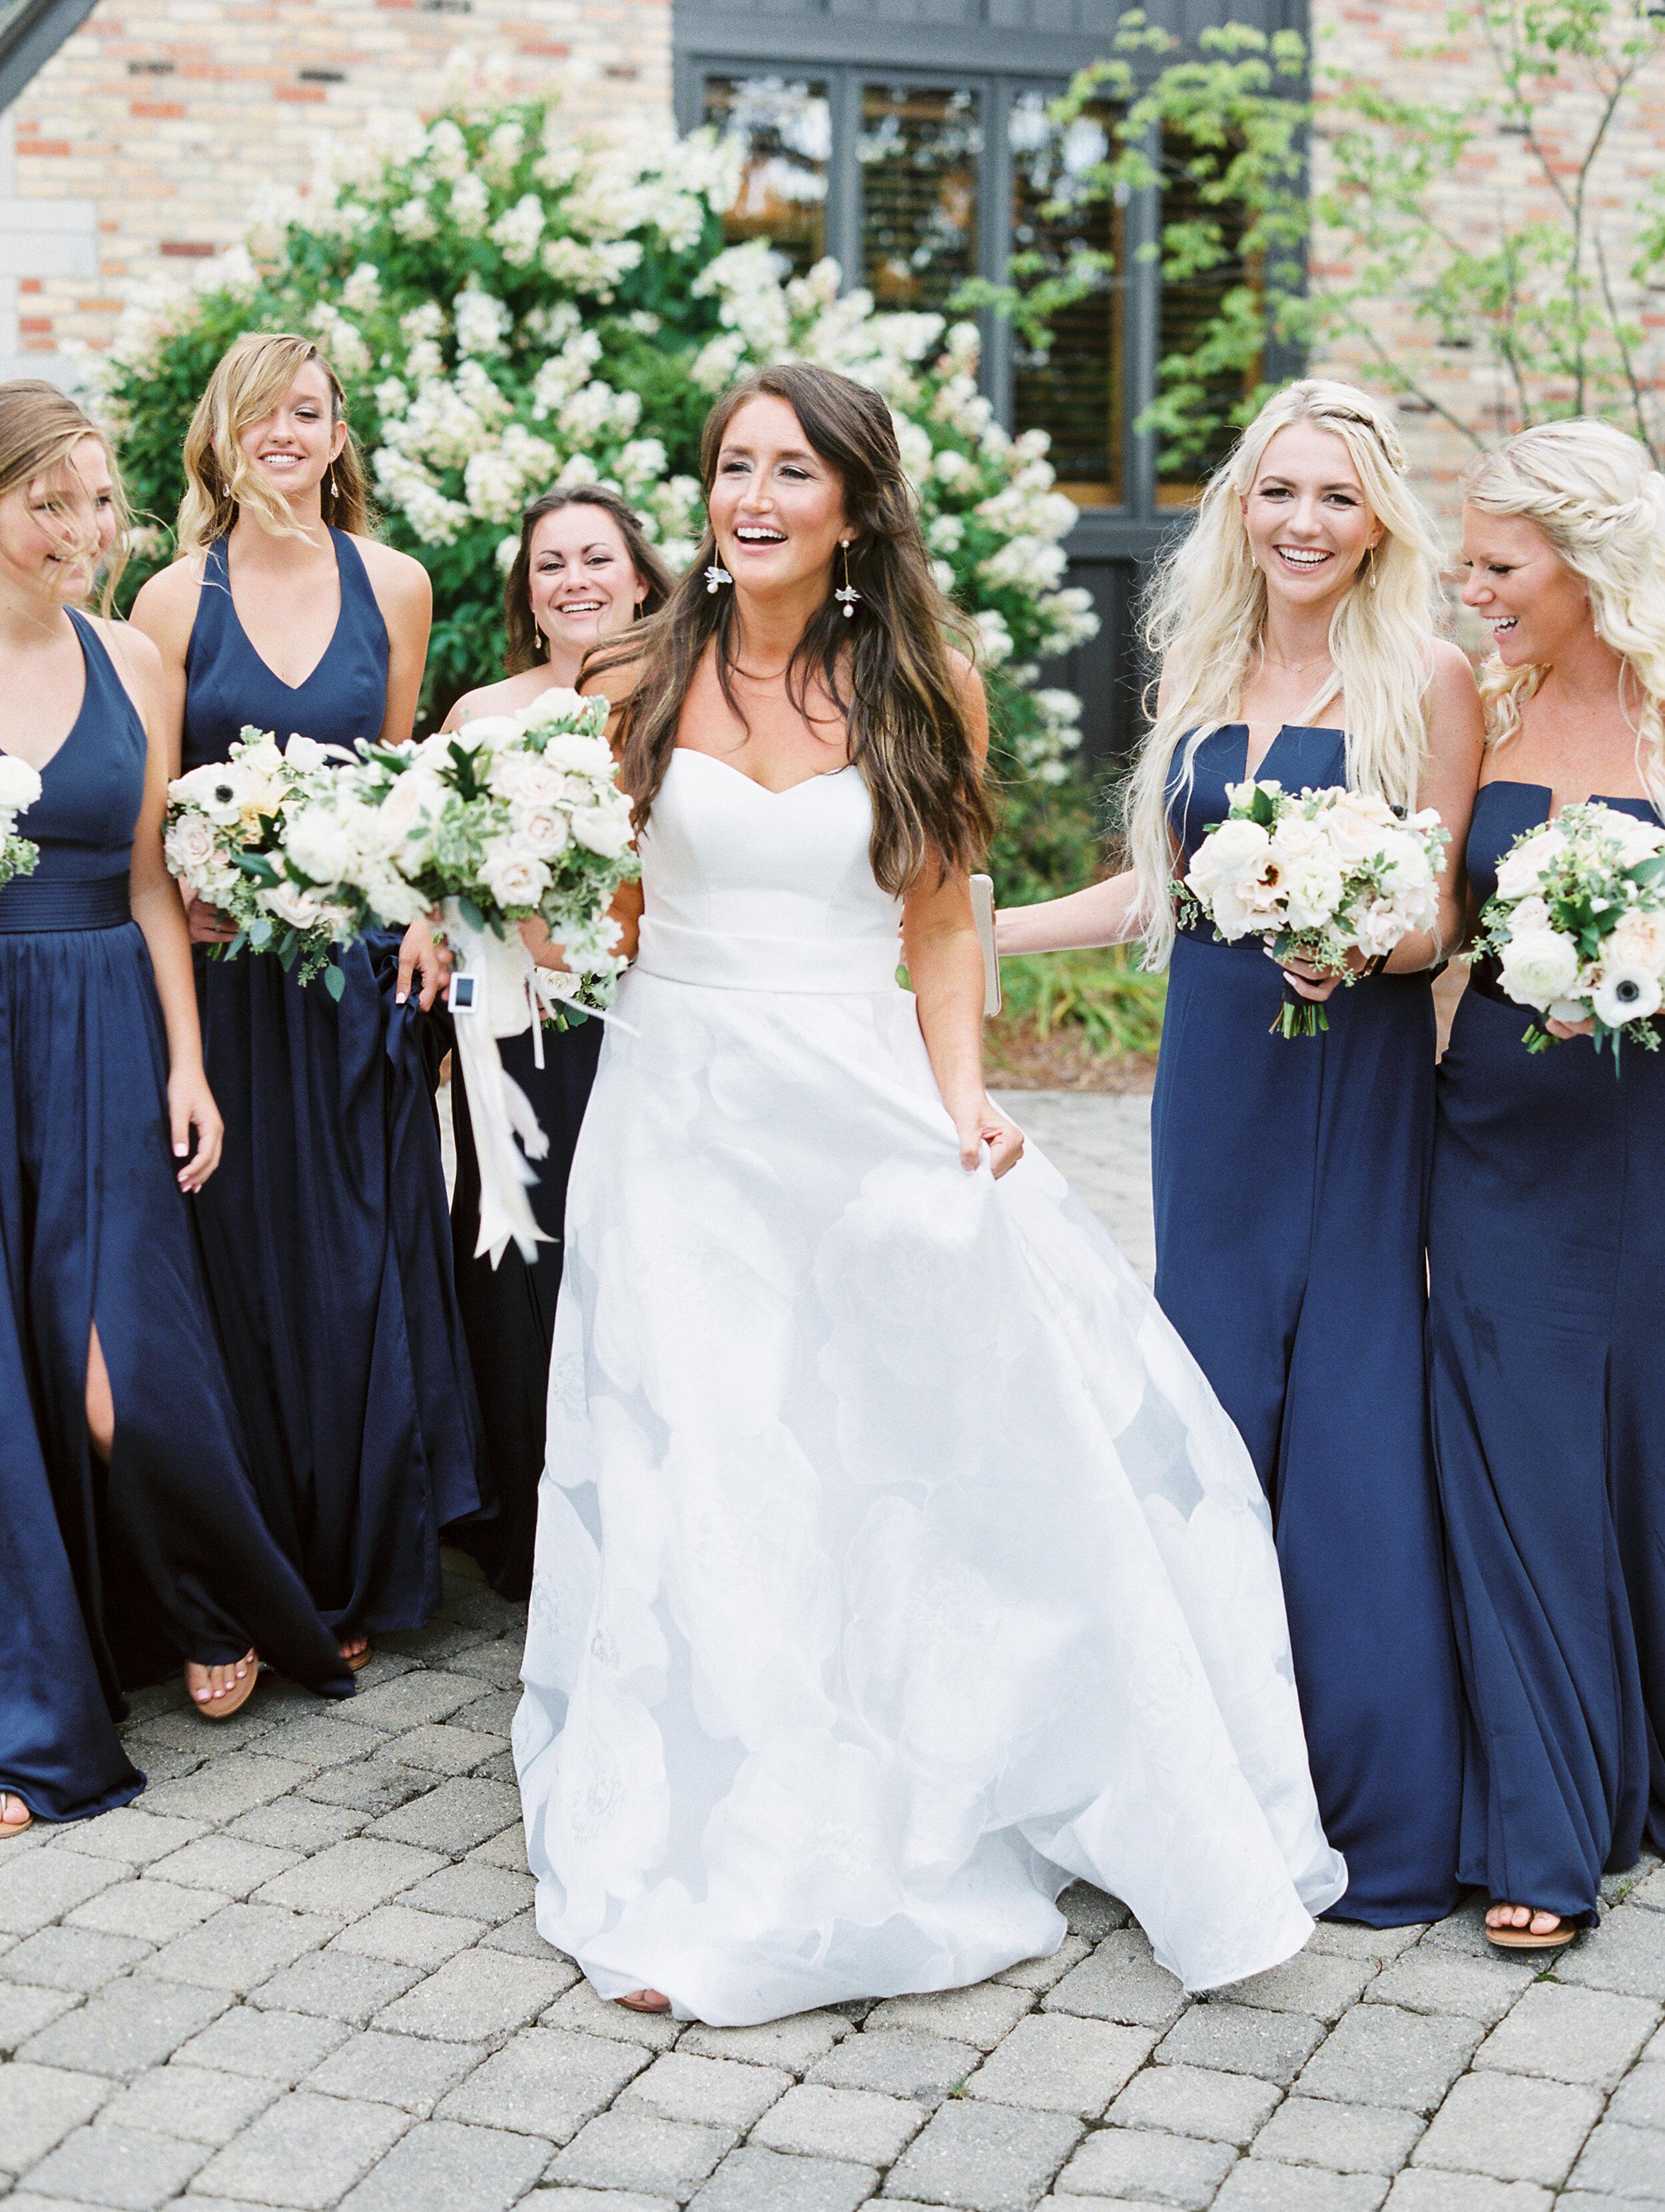 Kuiper+Wedding+Reception+Bridal+Party-112.jpg